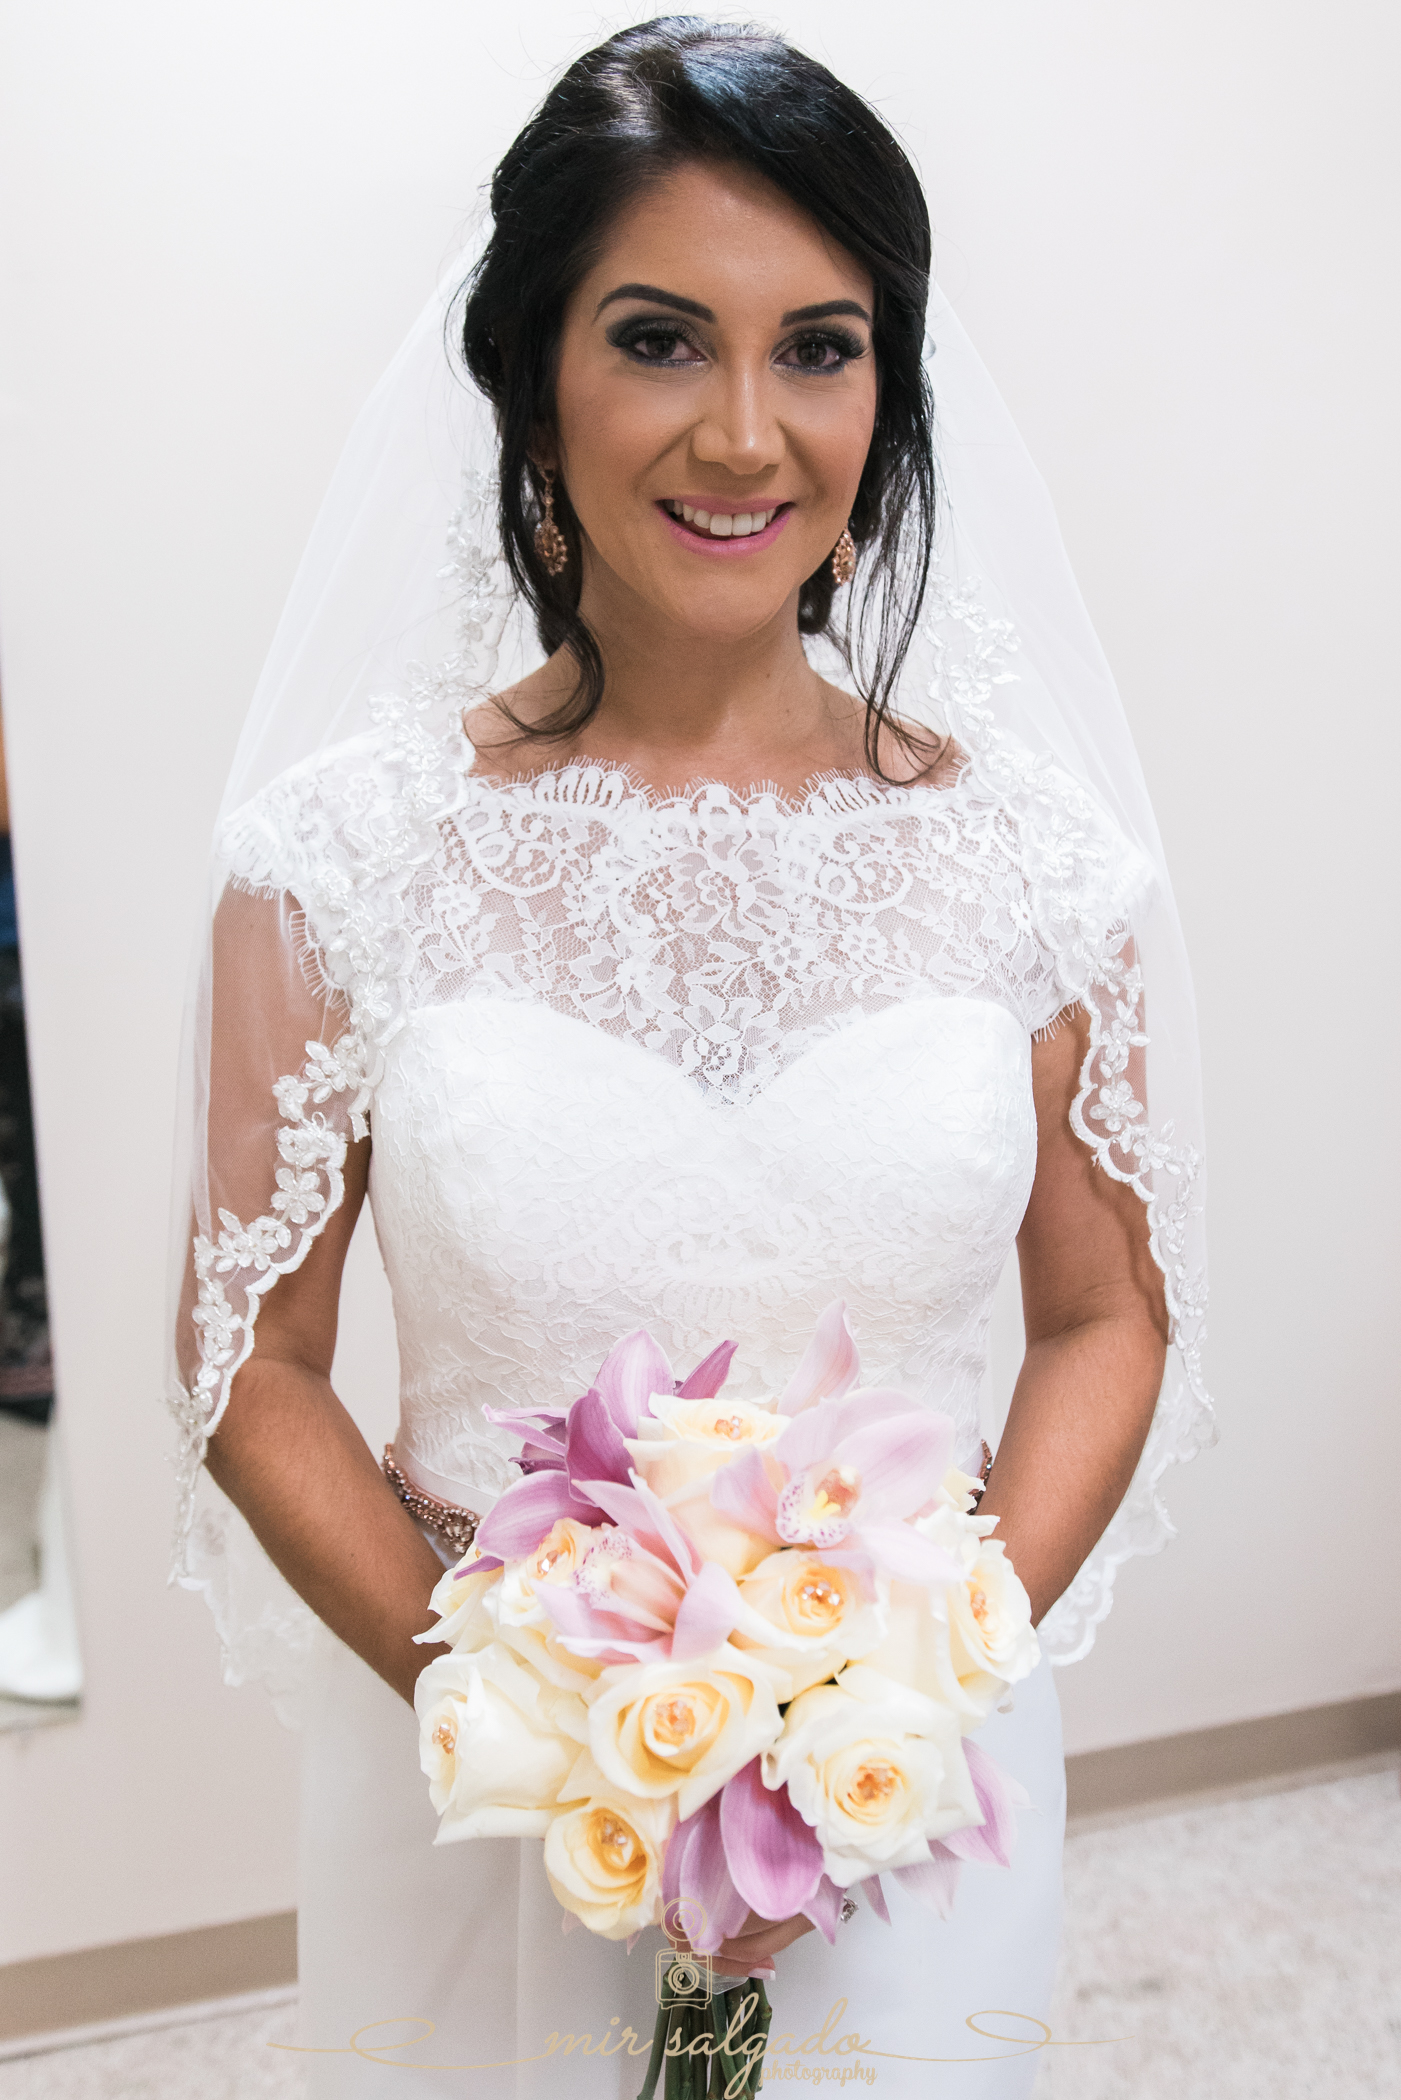 bride-getting-ready-photo, Bok-tower-gardens-wedding, Tampa-wedding-photographer